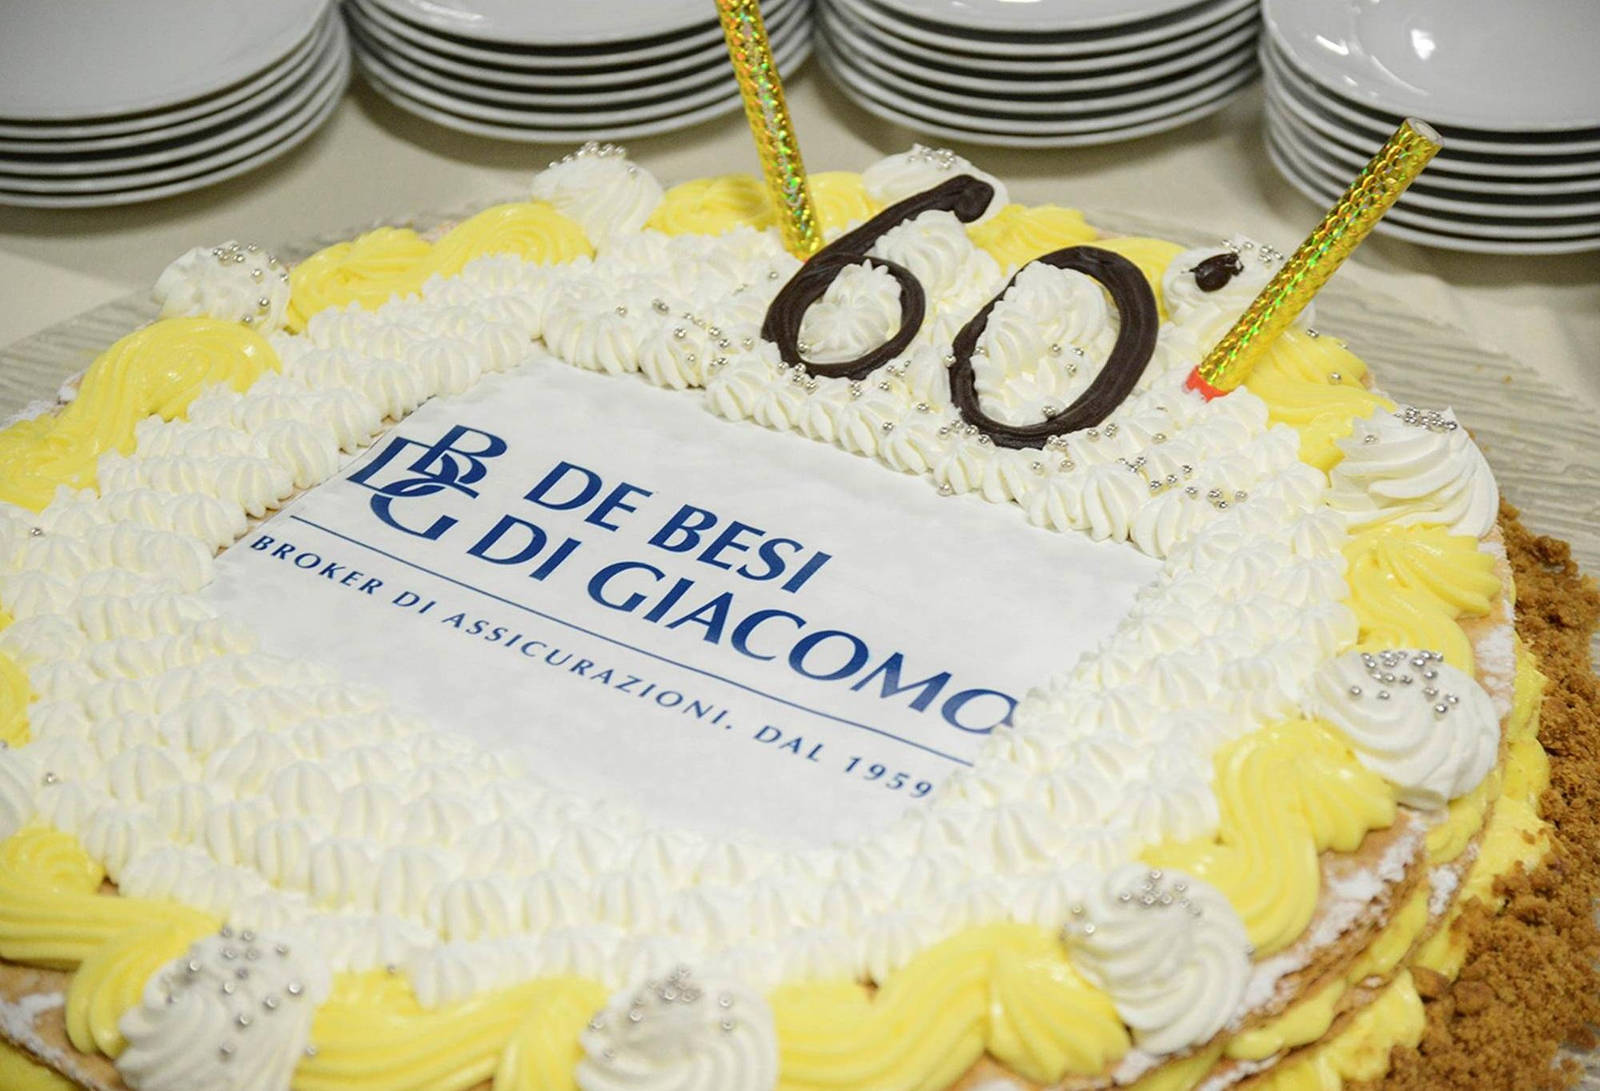 DBDG 60 anni